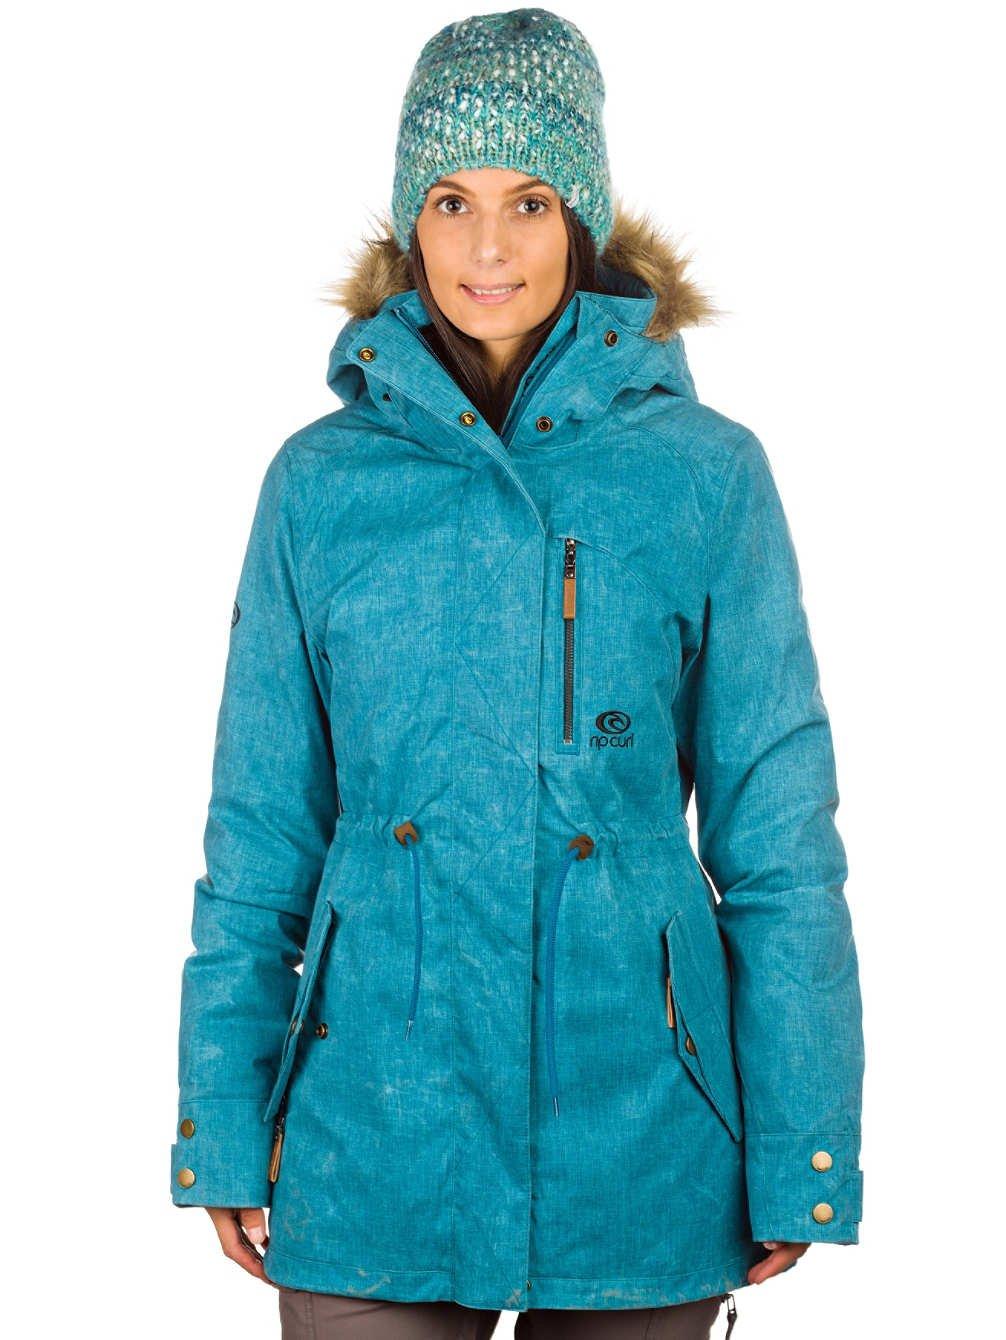 Damen Snowboard Jacke Rip Curl Spectrum Jacket online bestellen